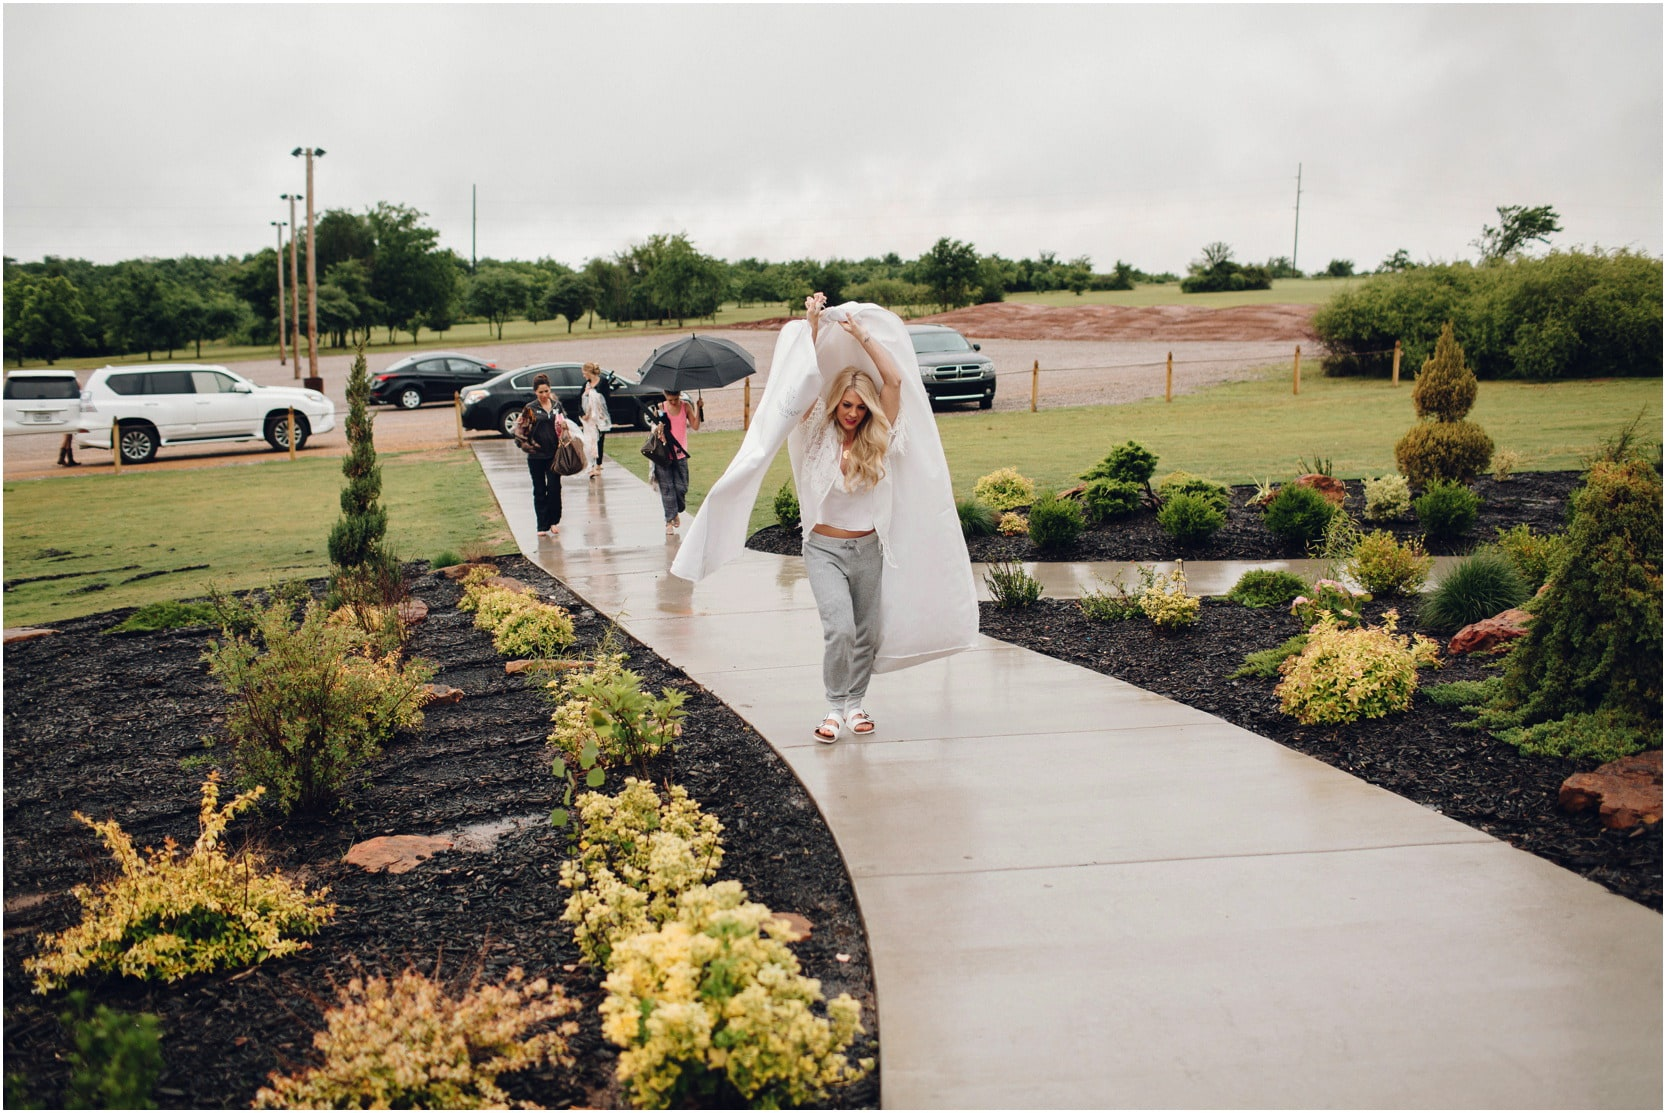 coderhillenburg_oklahoma_wedding__20_blogstomped